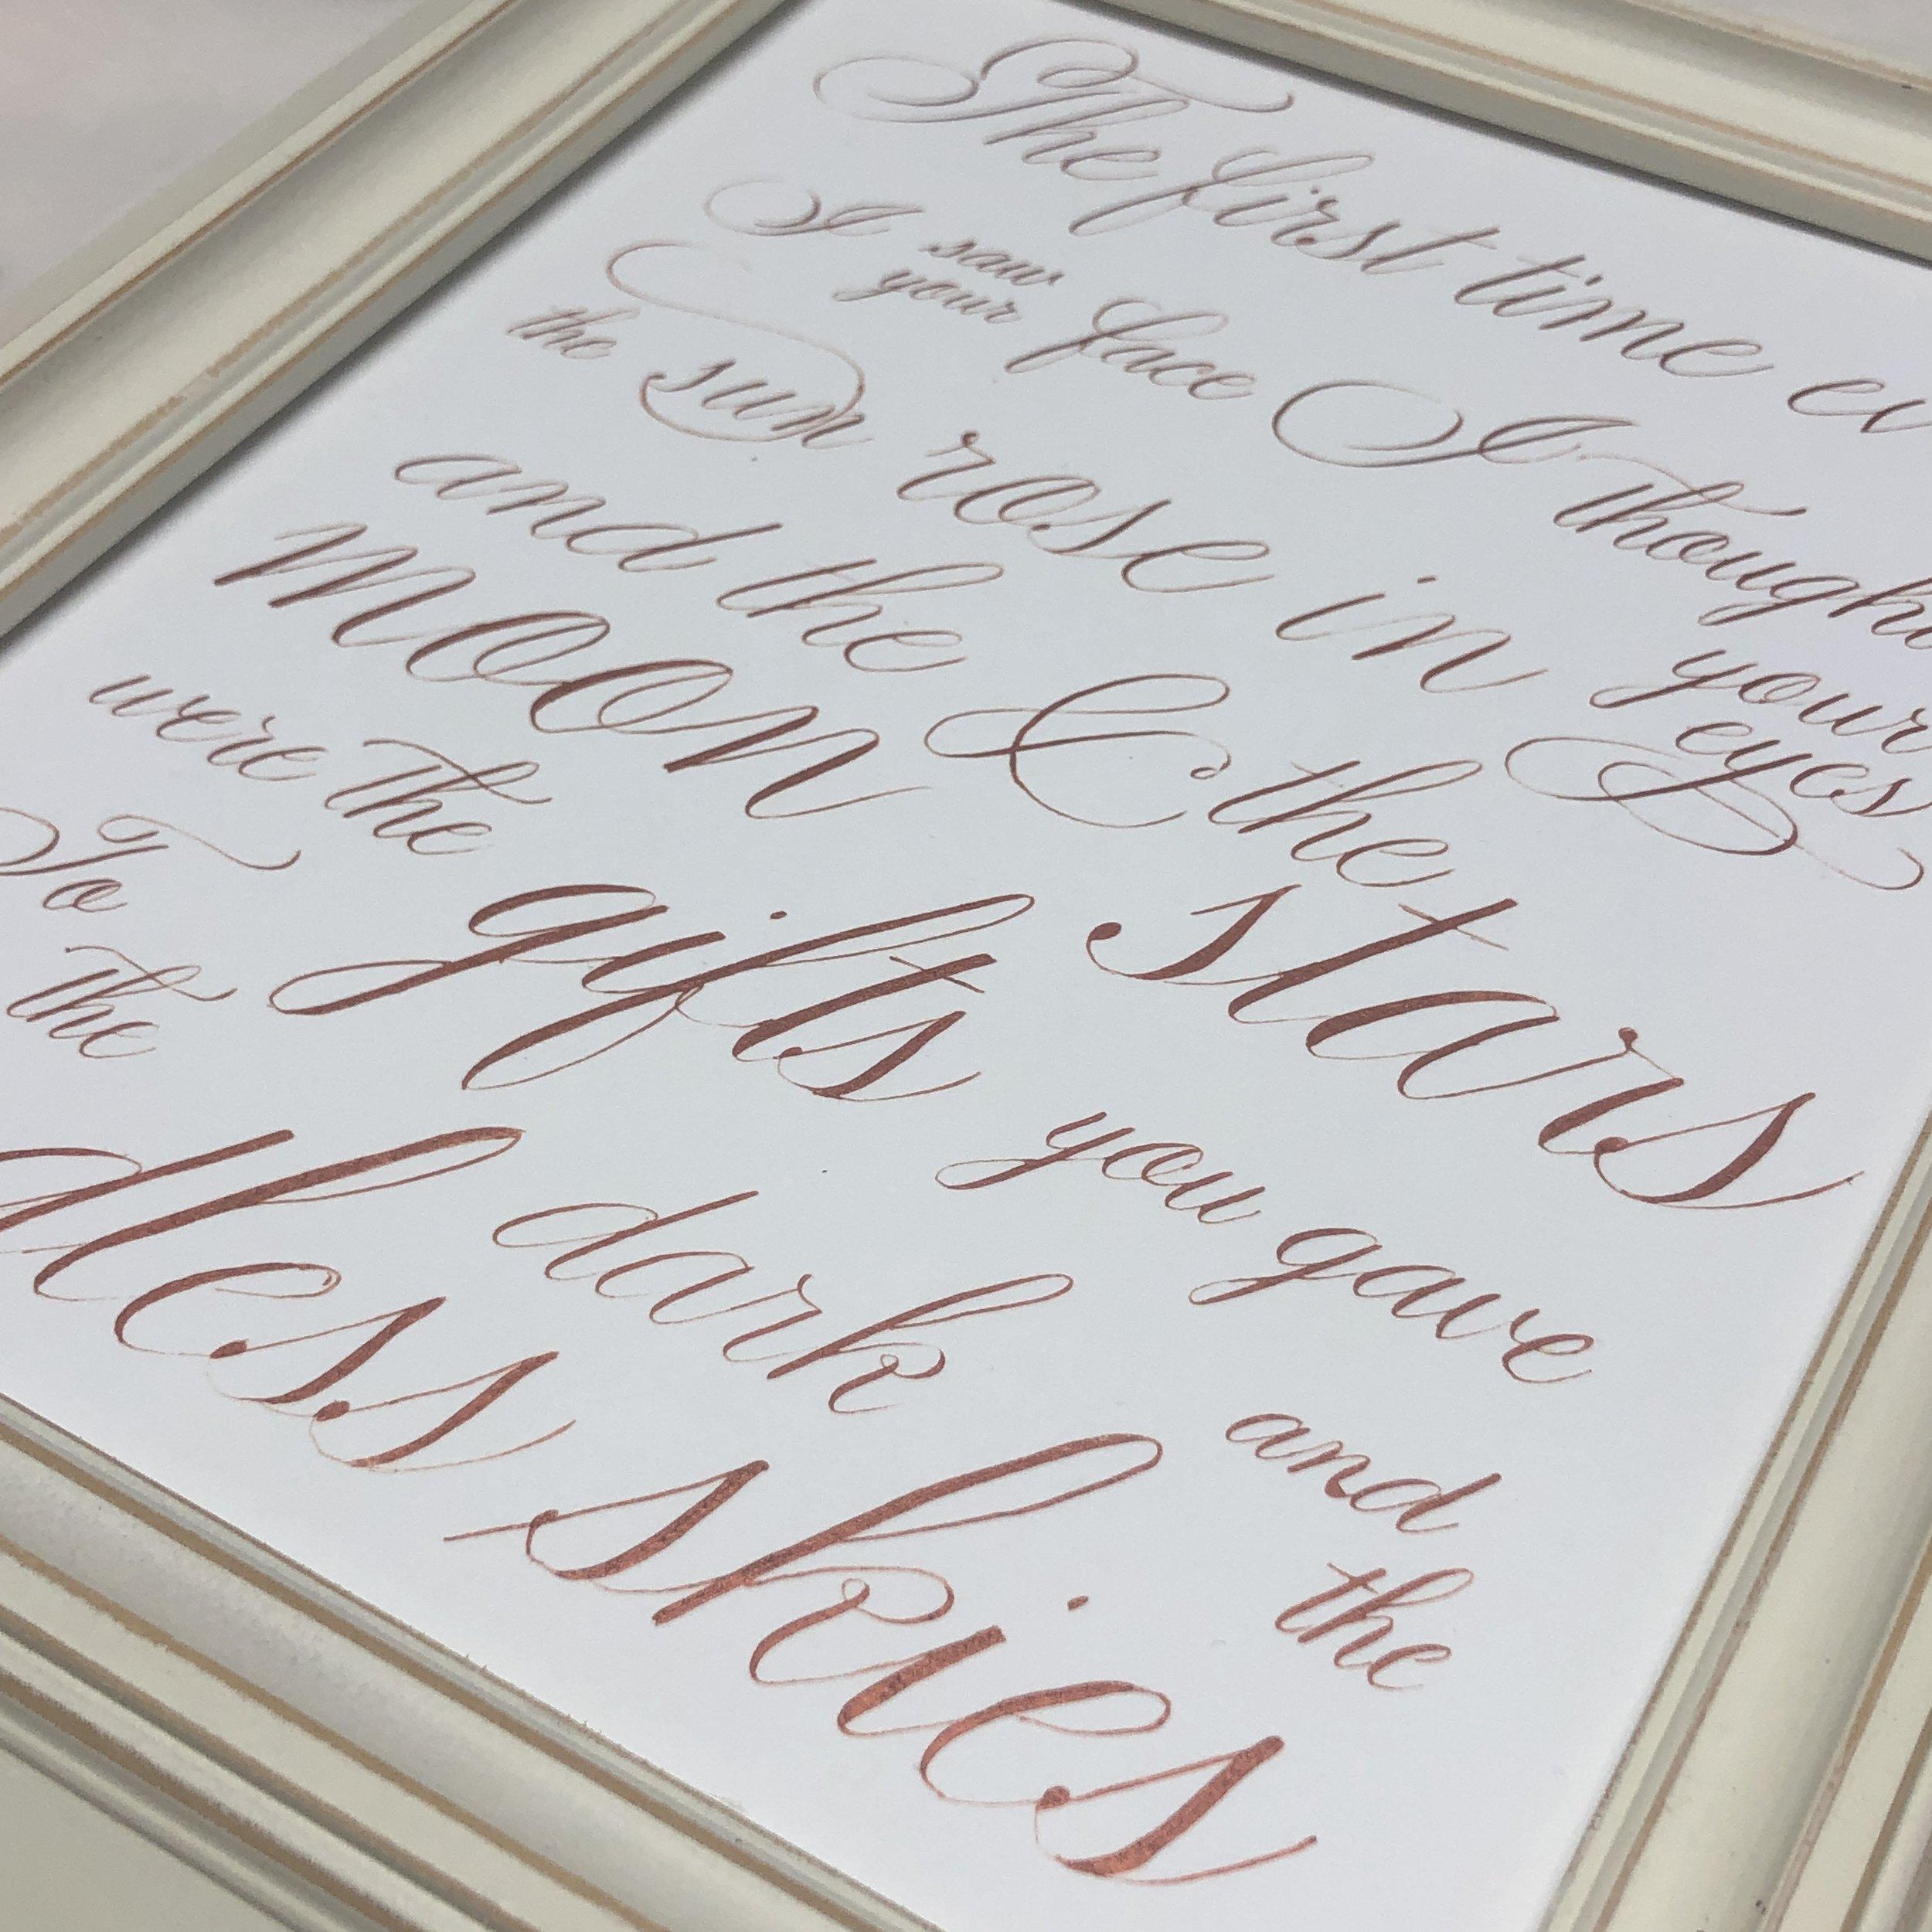 Central PA, York PA, JesSmith Designs, custom, wedding, invitations, bridal, Harrisburg, hanover, calligraphy, baltimore, wedding invitations, lancaster, gettysburg, 12-04 06.16.10.jpg